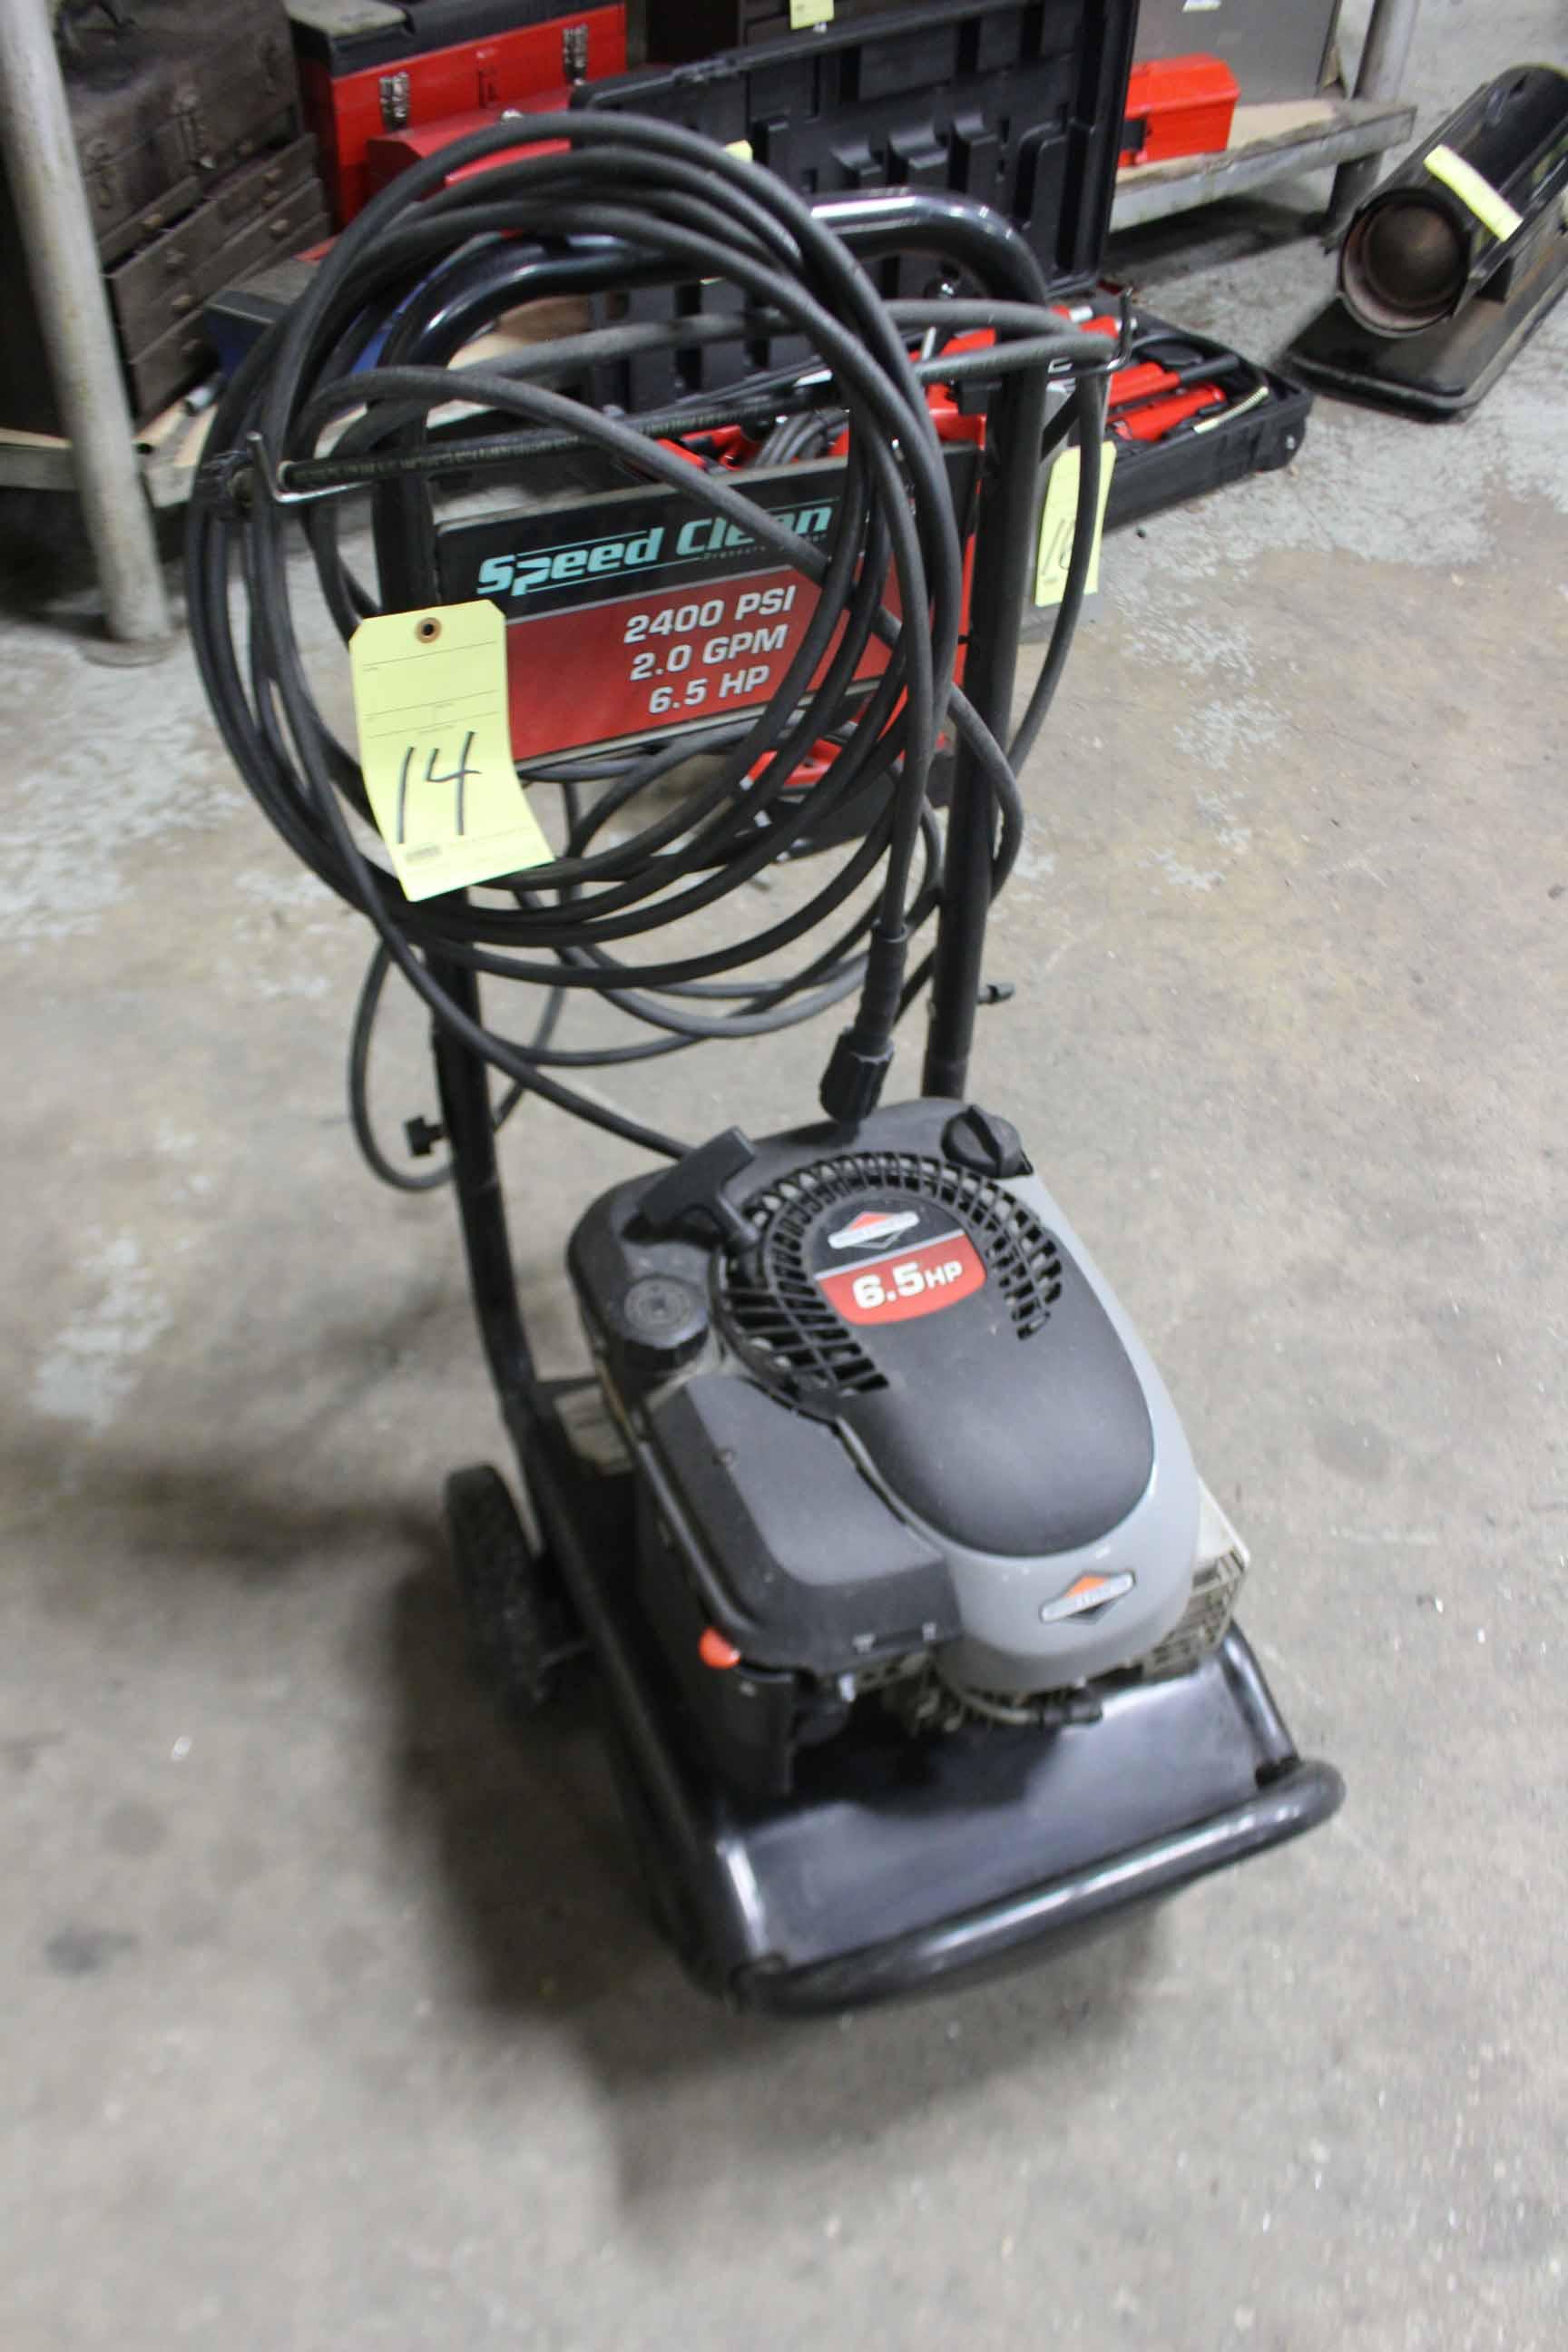 Lot 14 - POWER WASHER, SPEED CLEAN, BRIGGS & STRATTON ENGINE, 65 HP motor, 2,400 PSI